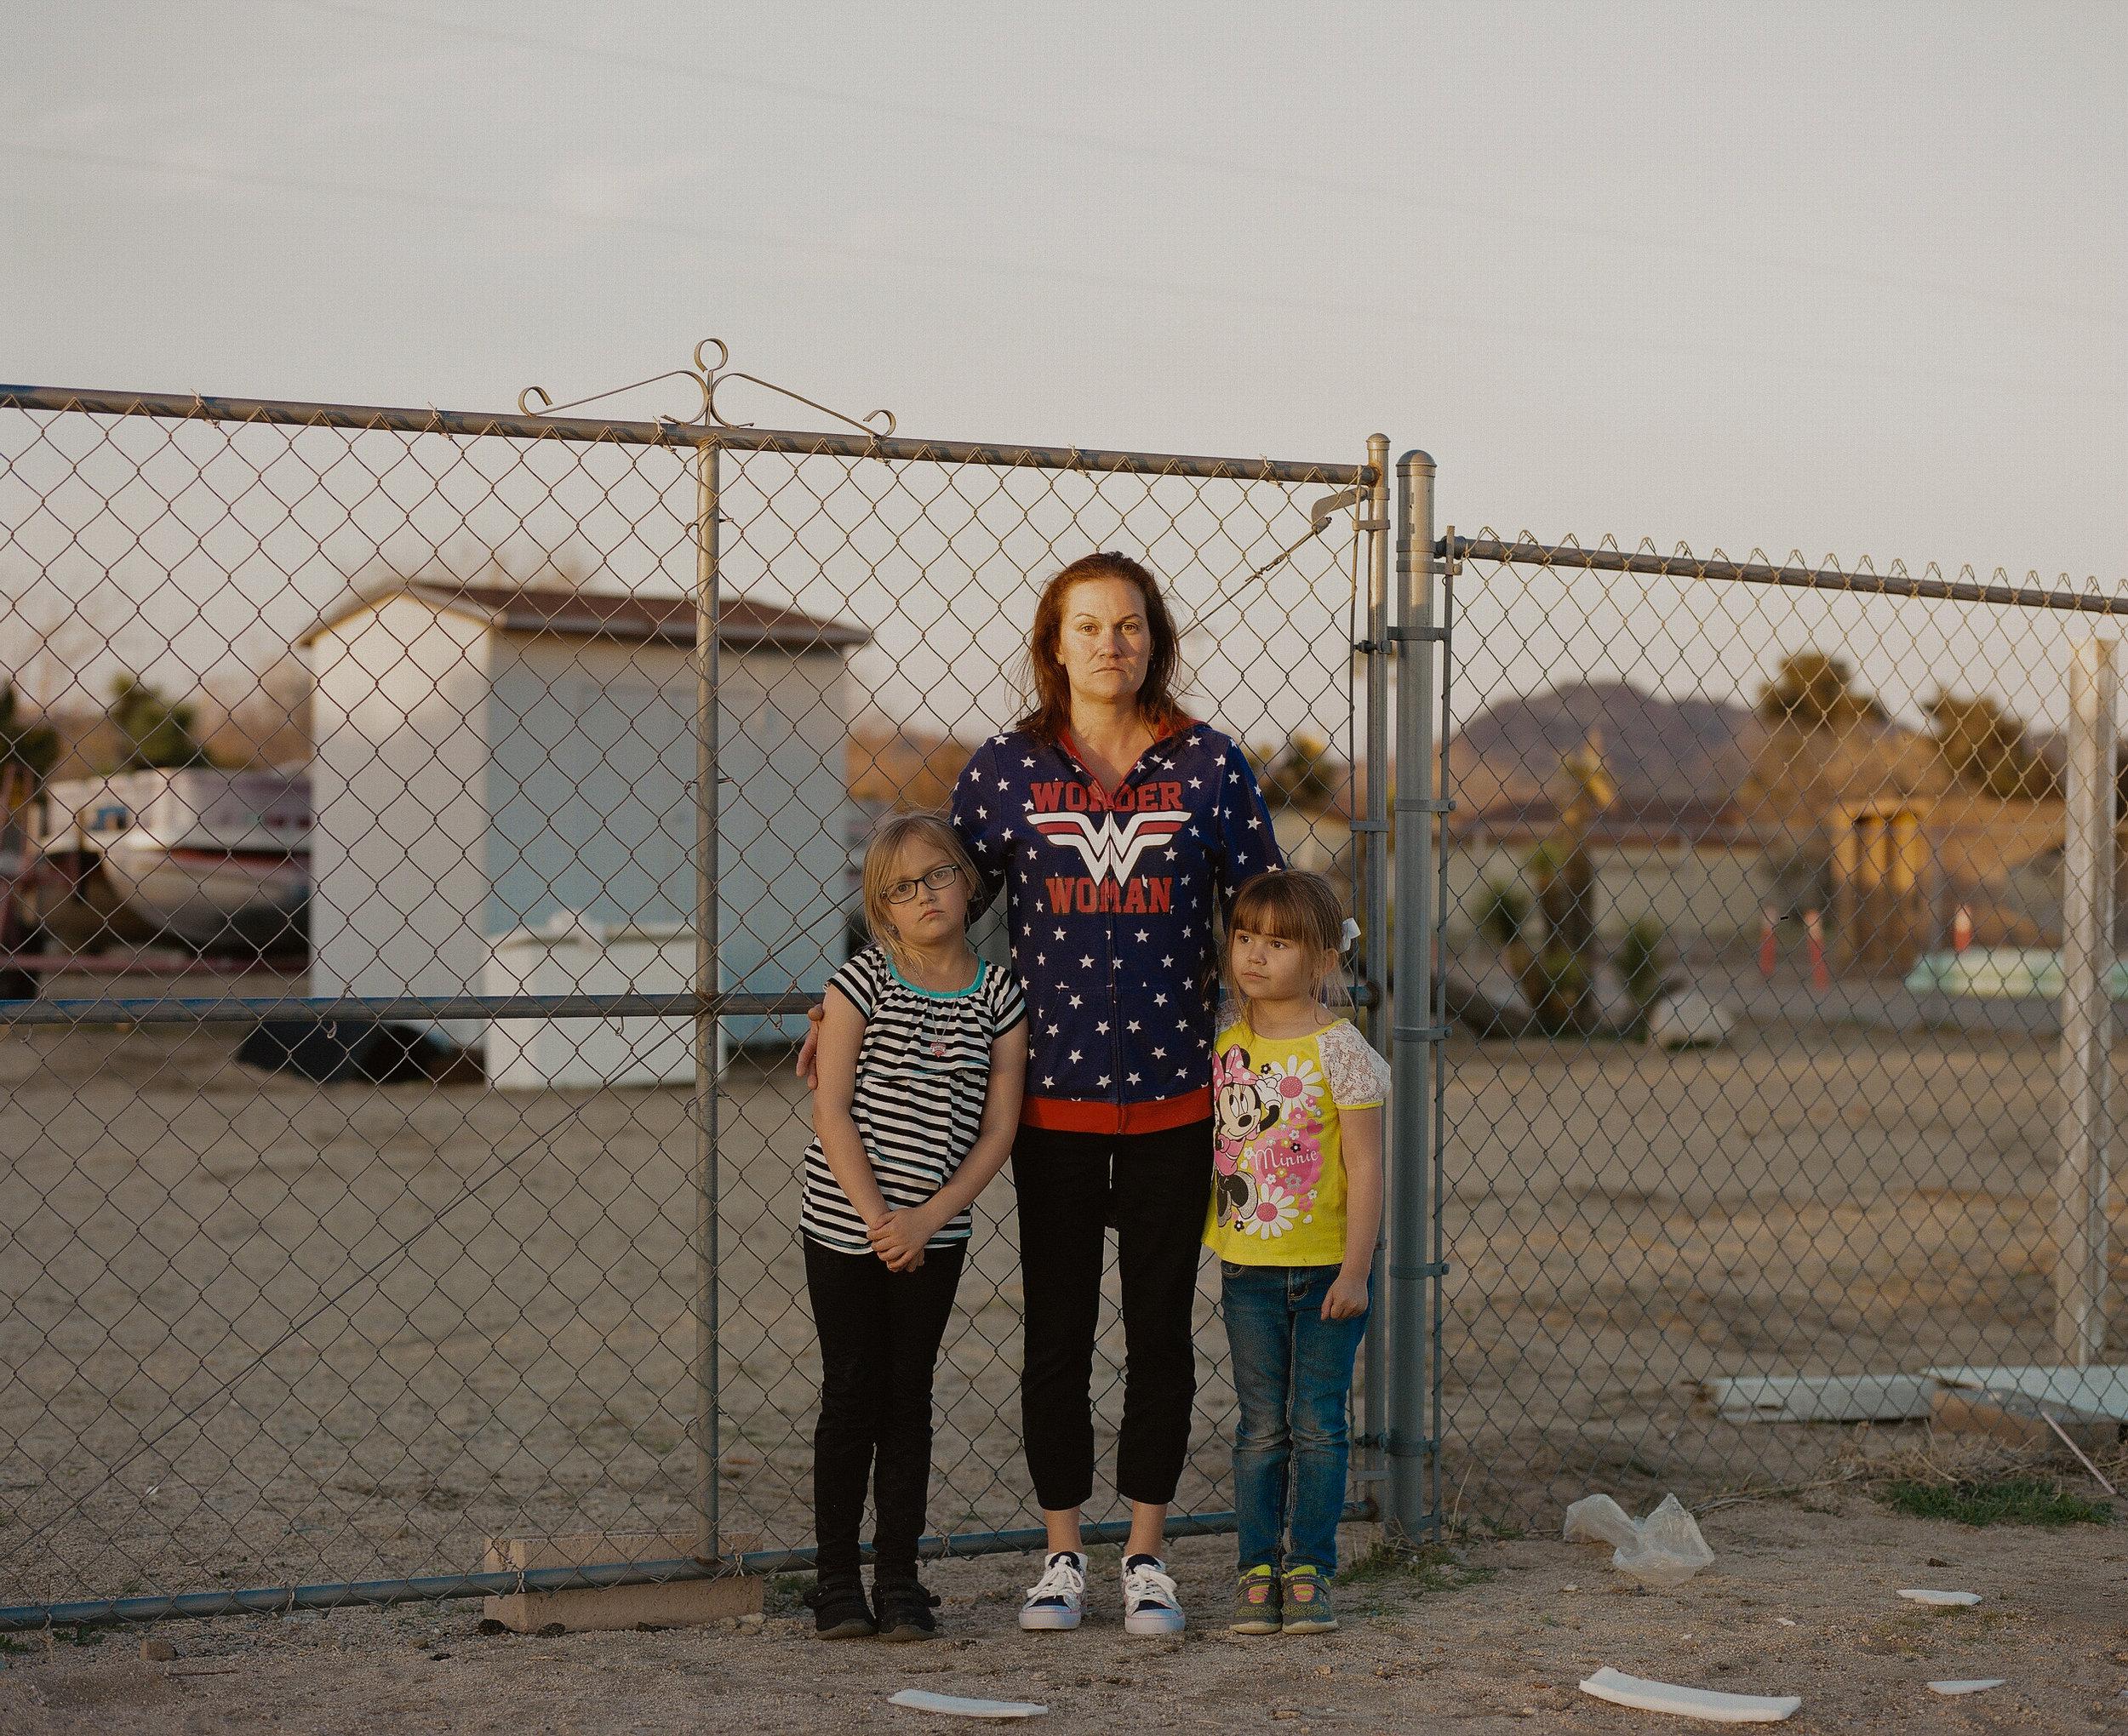 2_Kovi_Konowiecki_Angela and Daughters, Yucca Valley.jpg